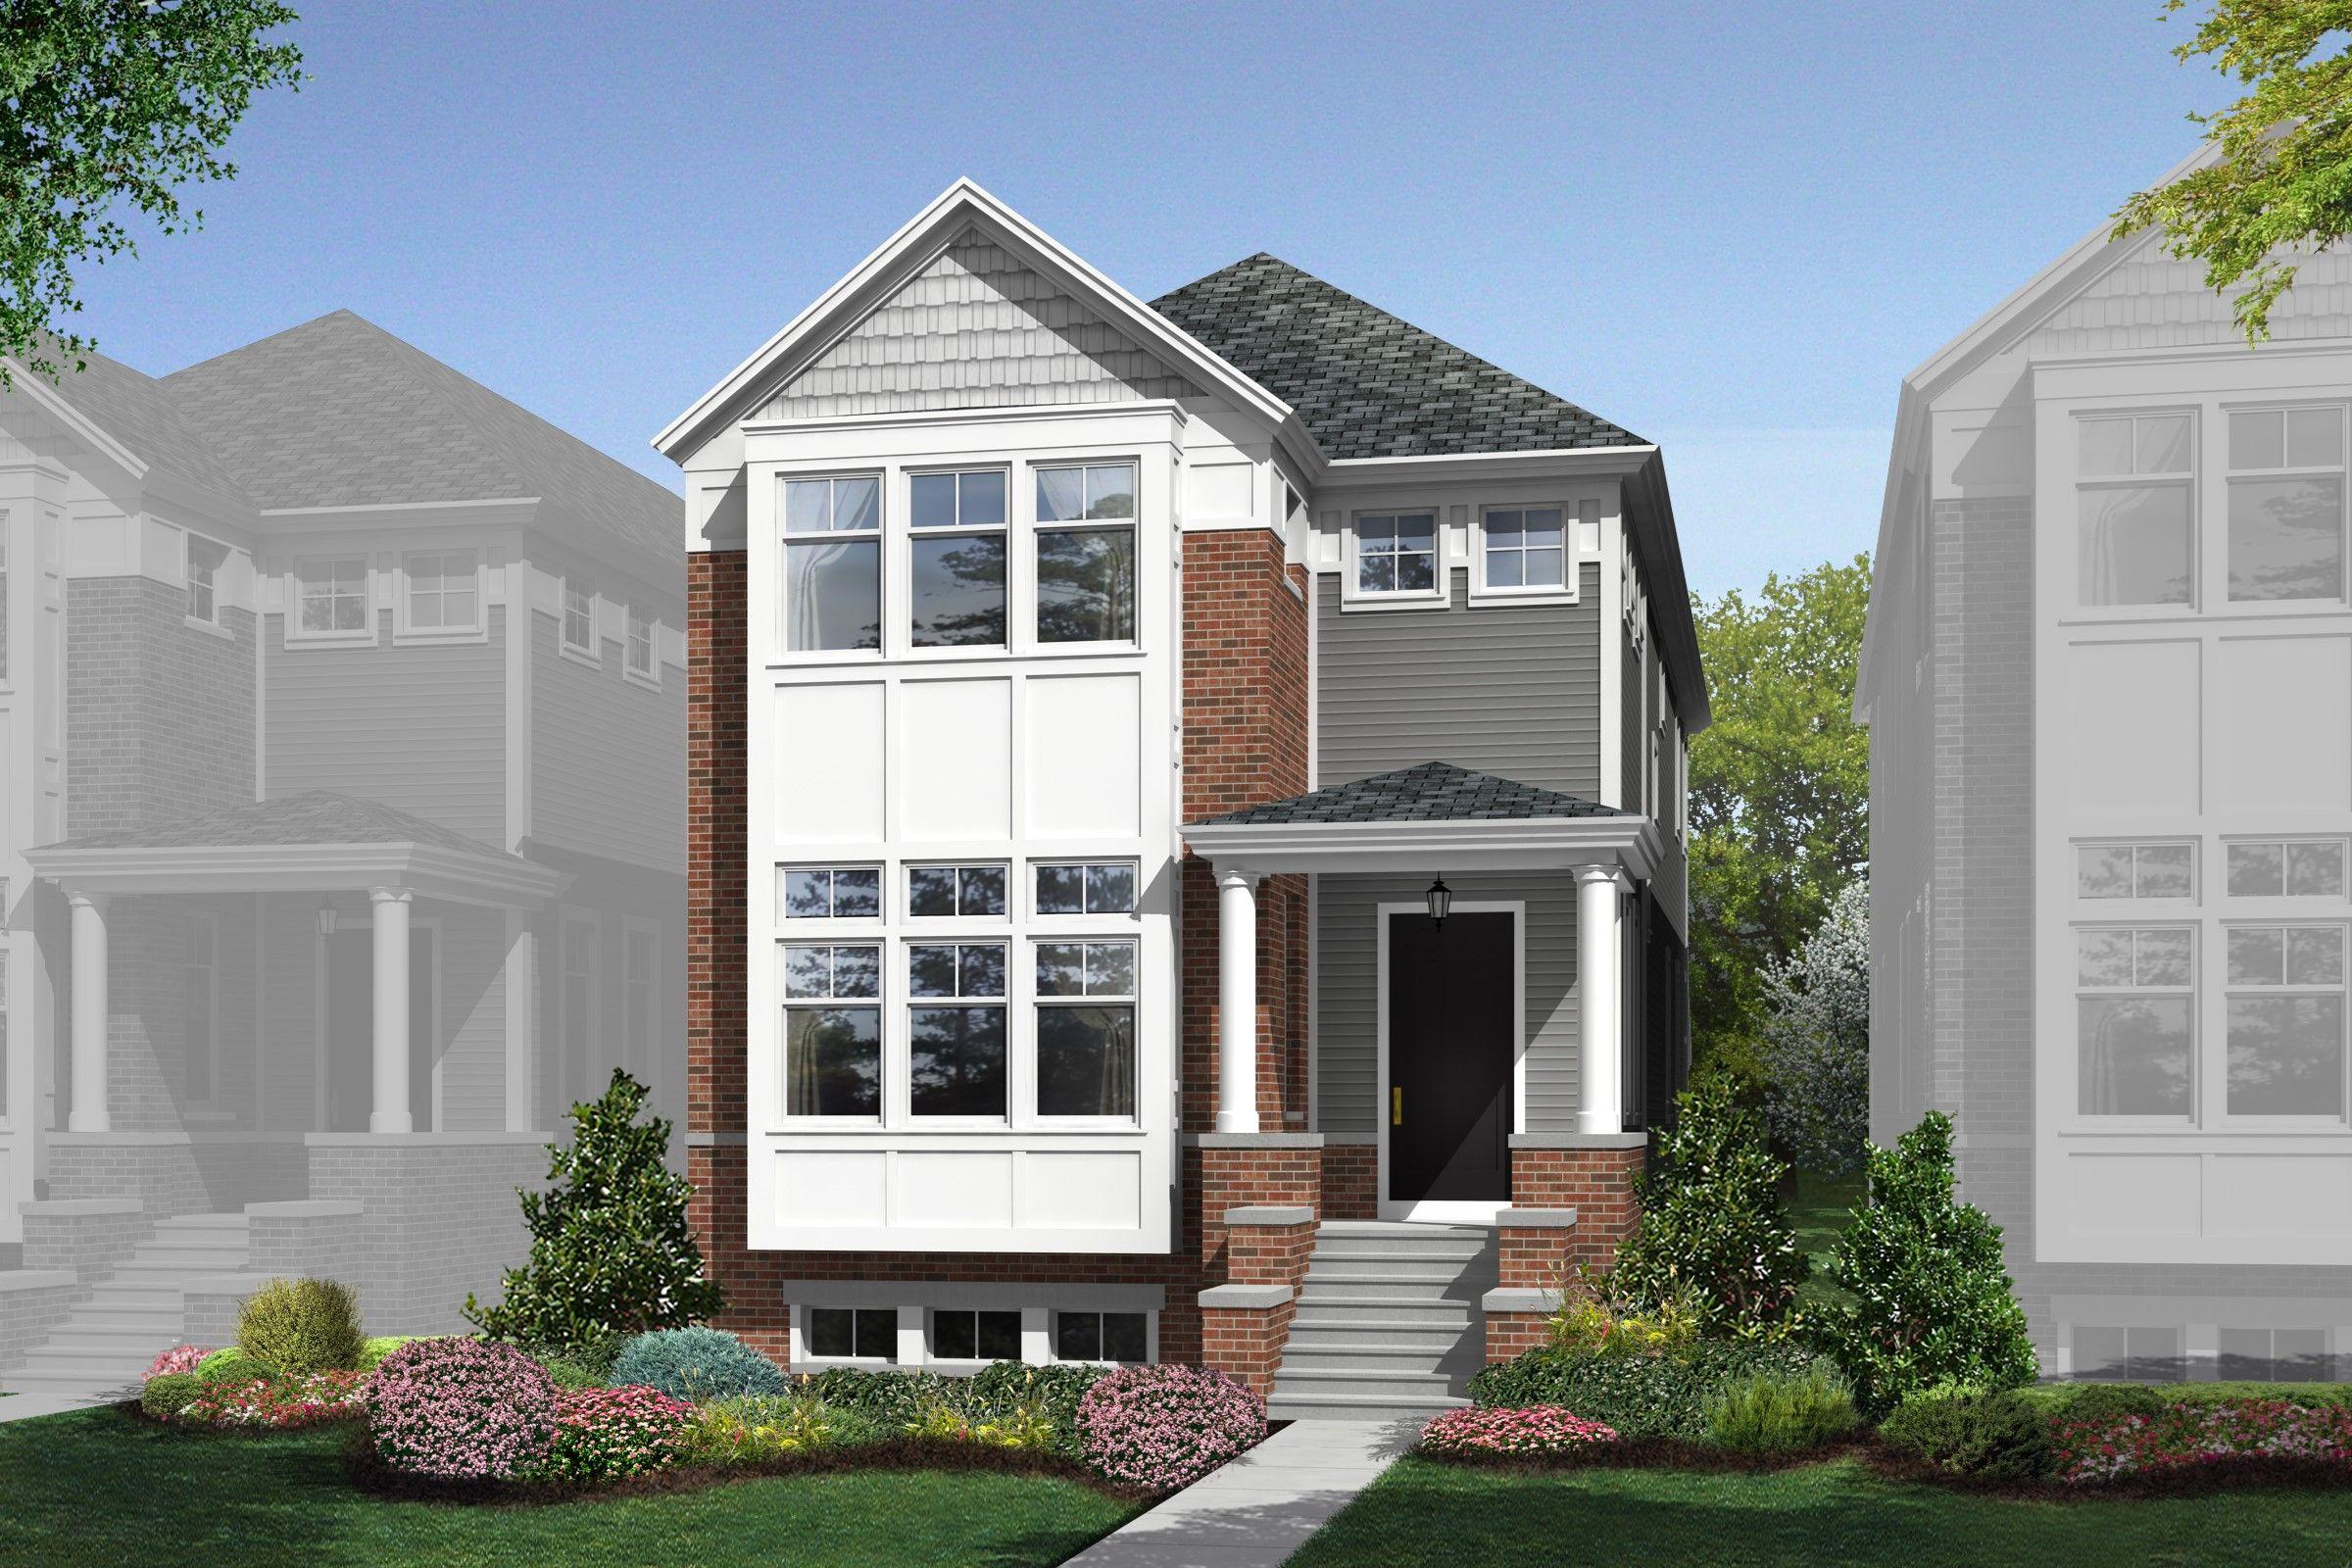 Single Family for Sale at Dickinson 6072 N Sauganash Avenue, Homesite 23 Chicago, Illinois 60646 United States